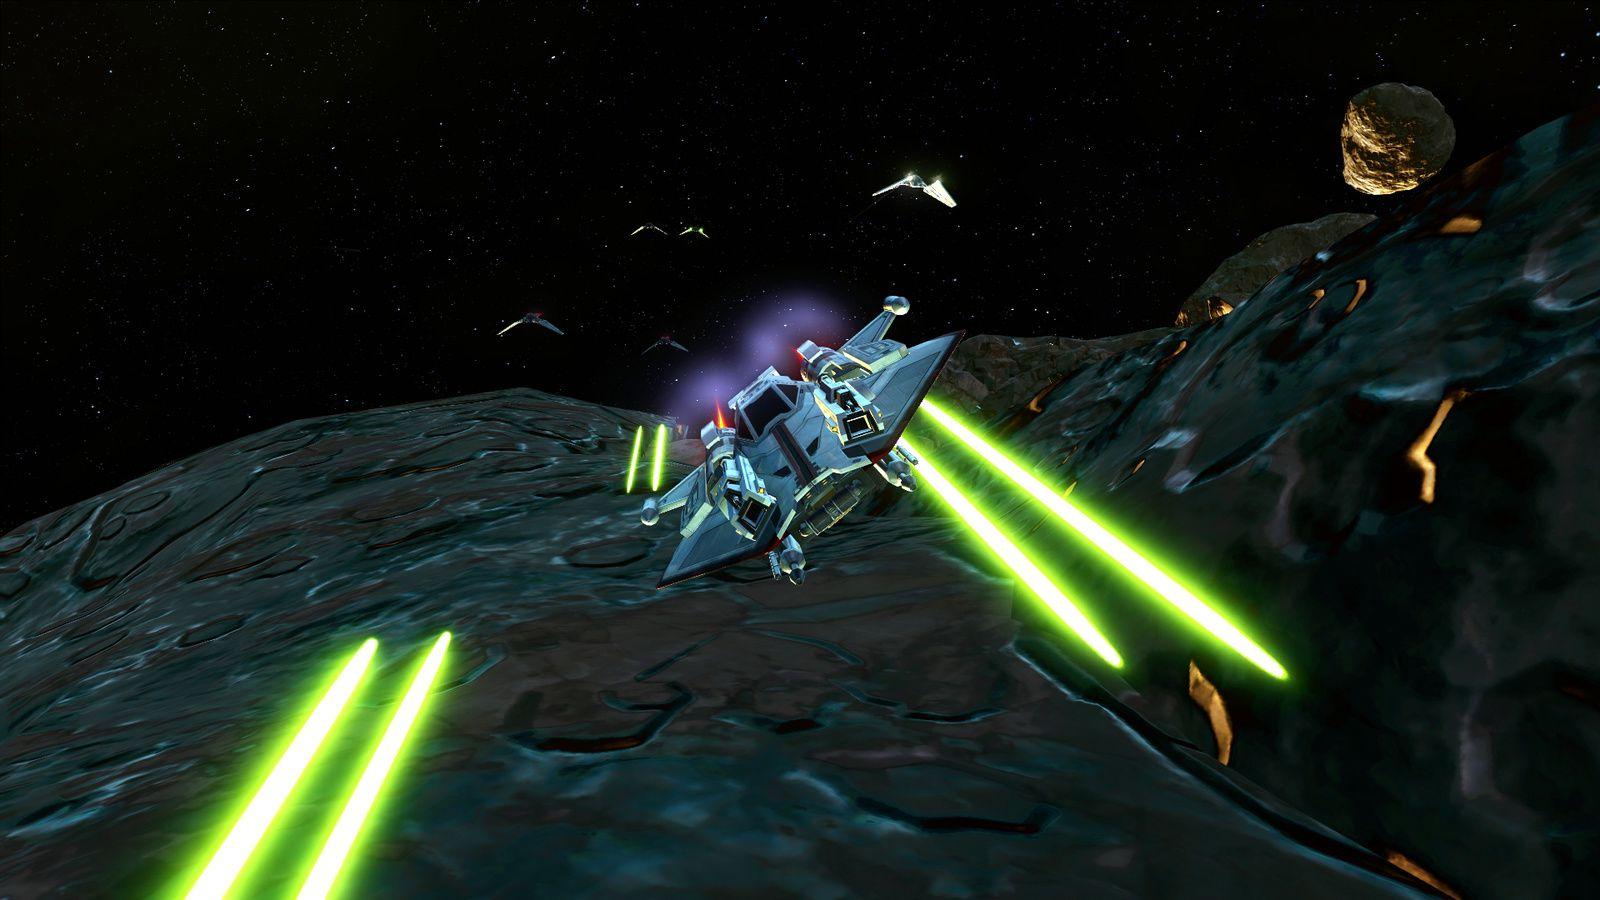 L'extension Galactic Starfighter de Star Wars : The Old Republic disponible pour tous